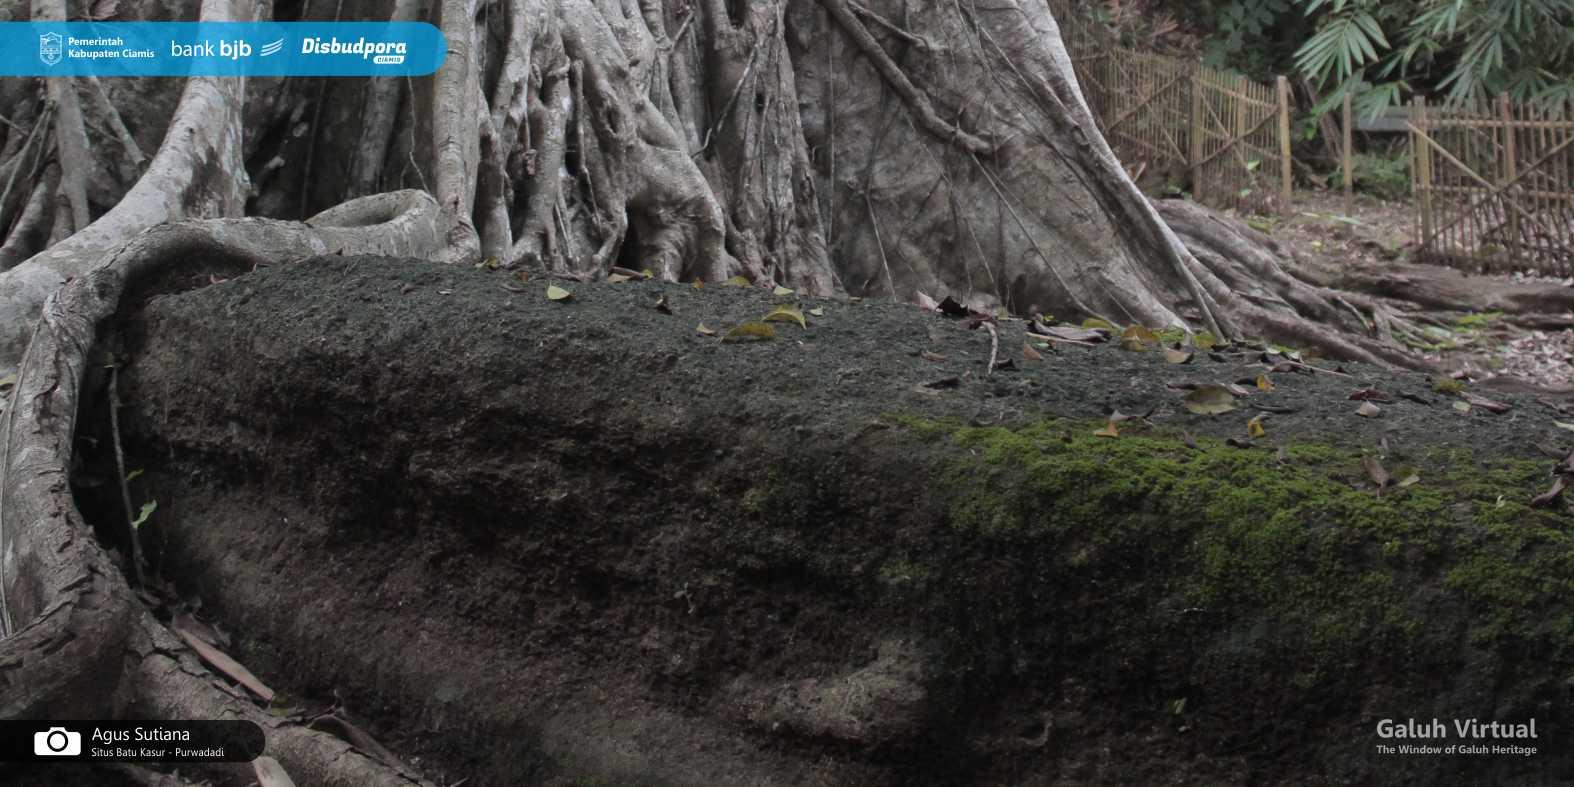 Situs Batu Kasur - Purwadadi